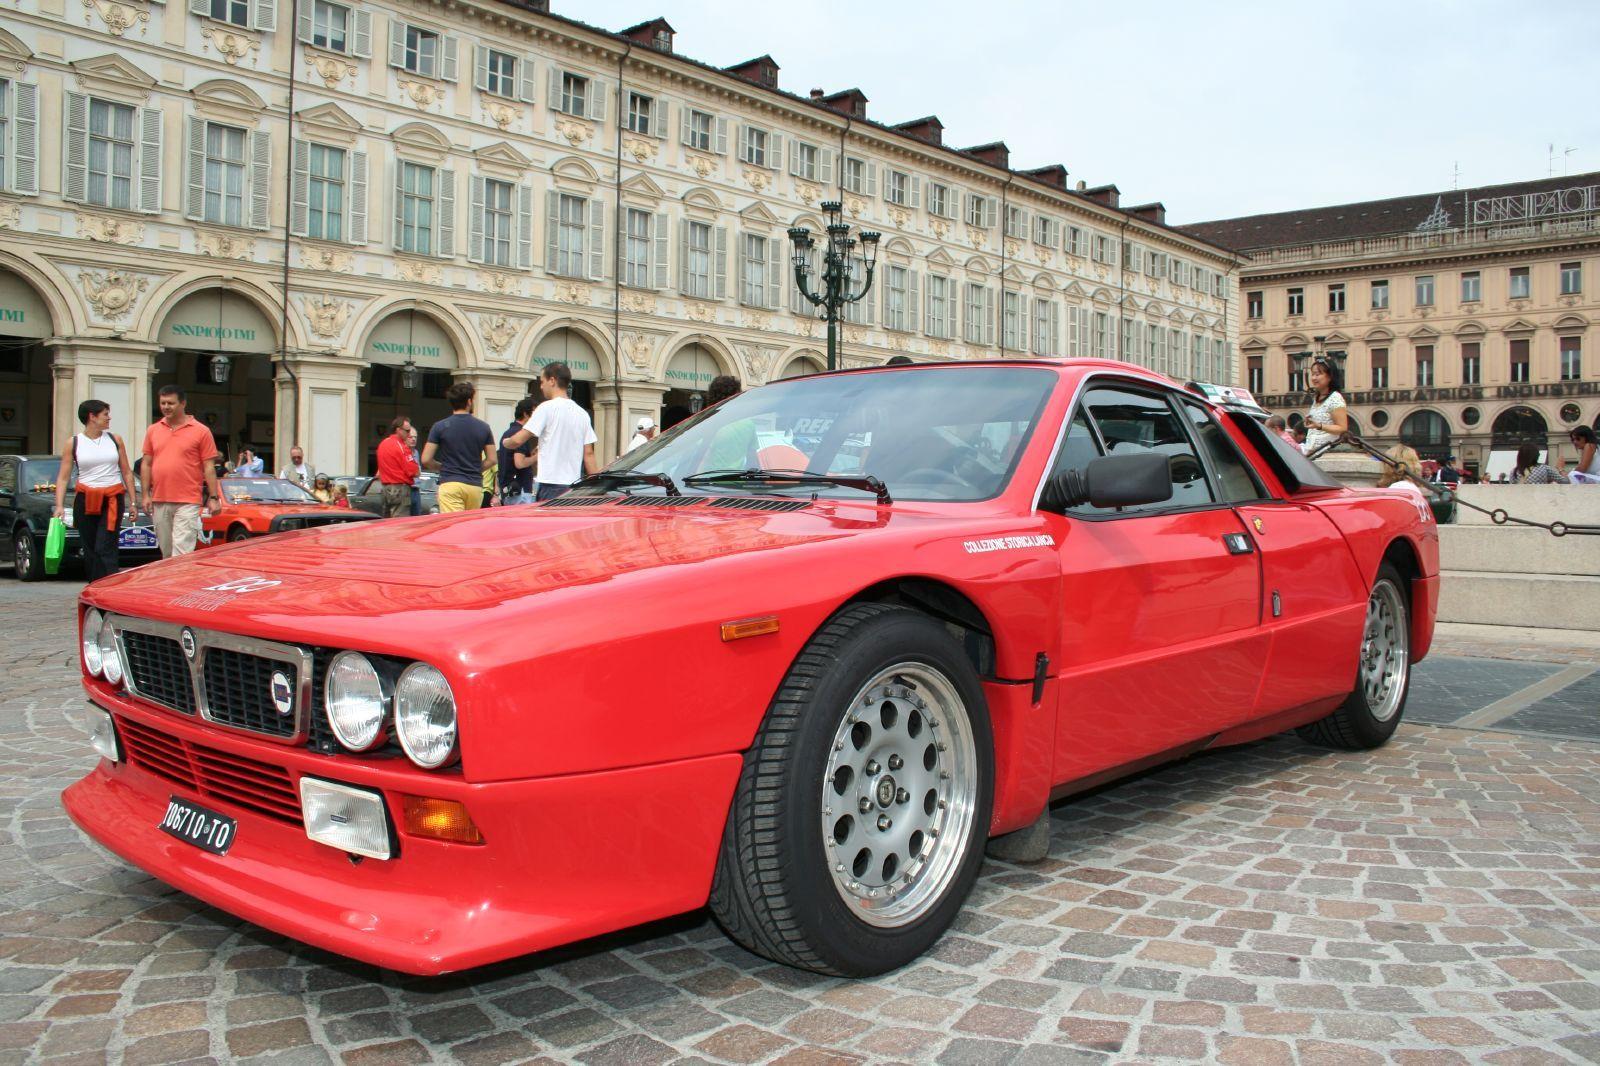 Lancia 037 | File:Lancia Rally 037 Stradale 01.jpg - Wikimedia ...